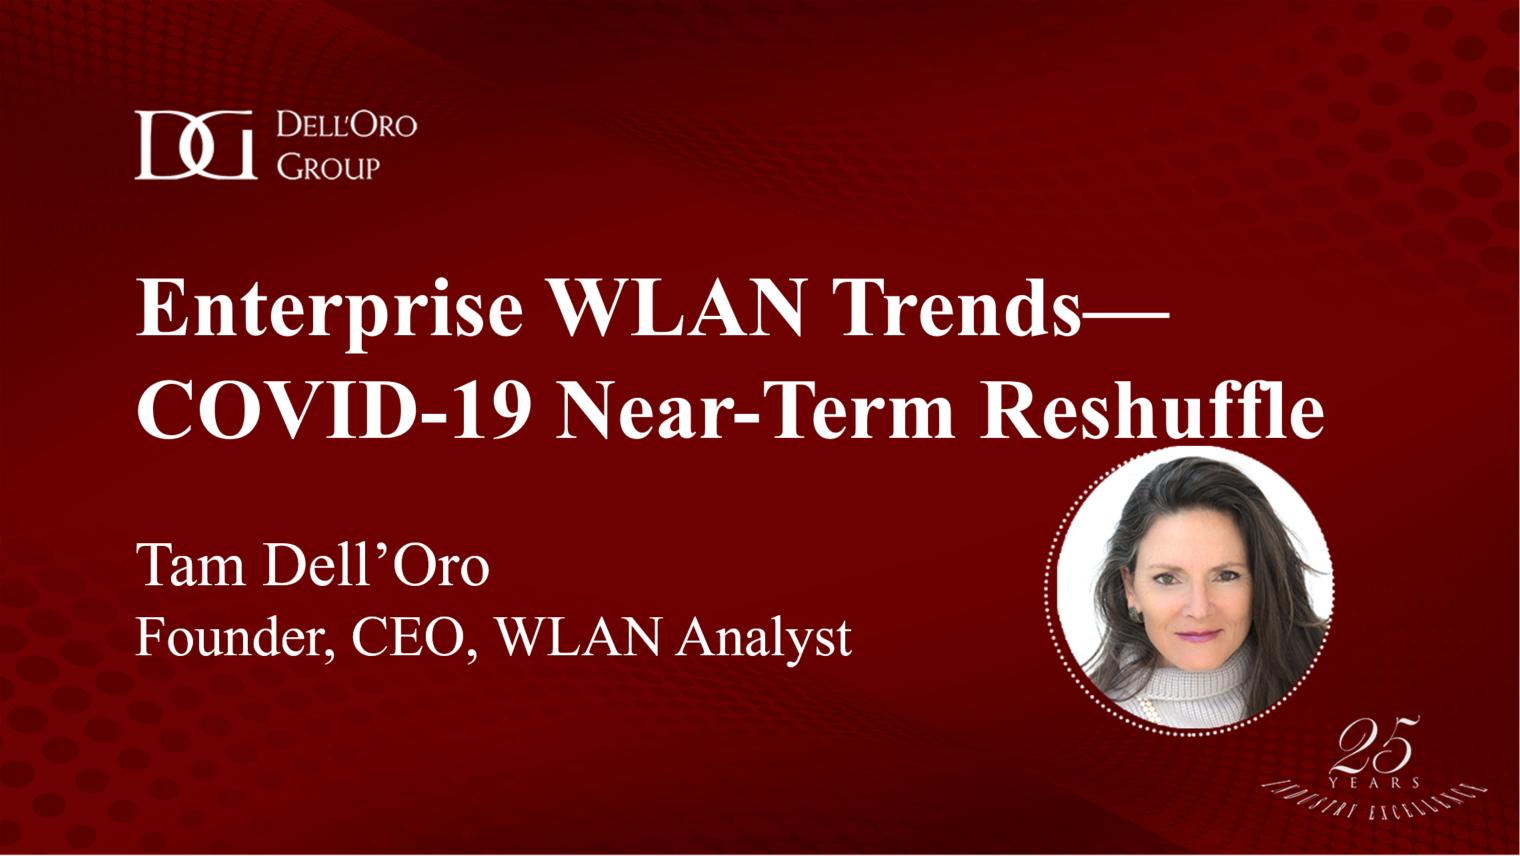 Analyst Talk - Enterprise WLAN Trends - COVID-19 Near-Term Reshuffle